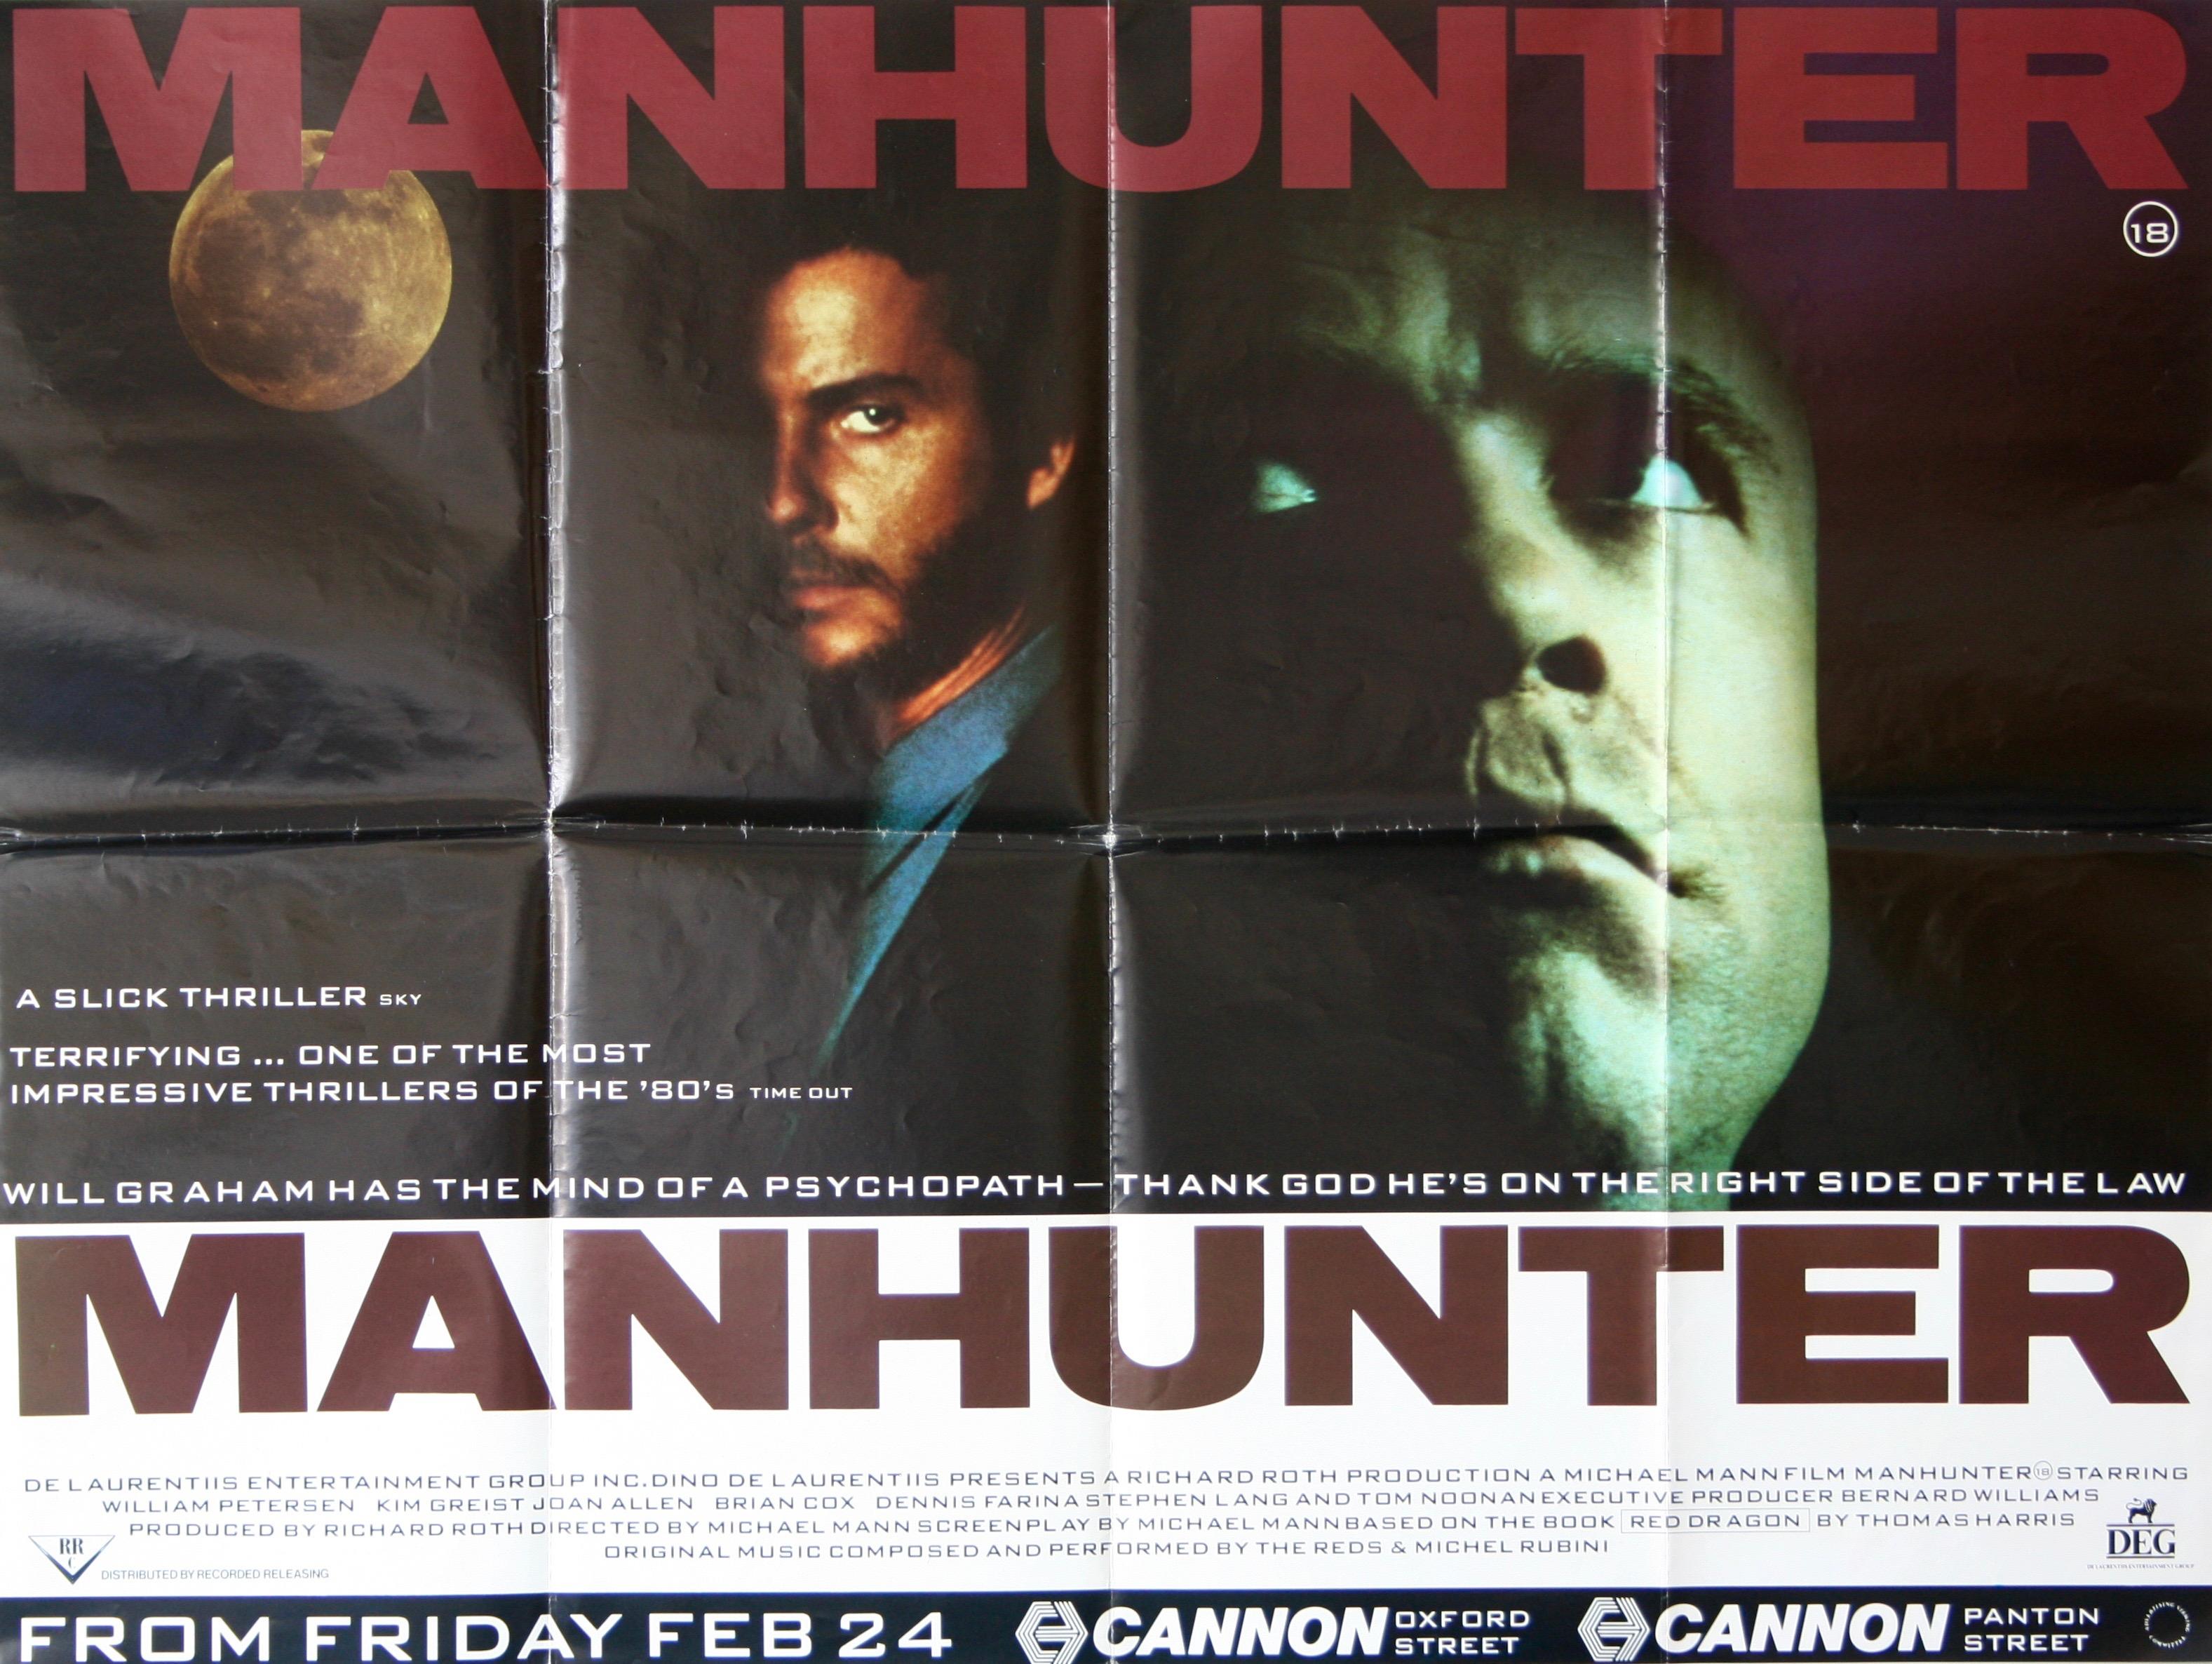 Manhunter-Movie-Poster